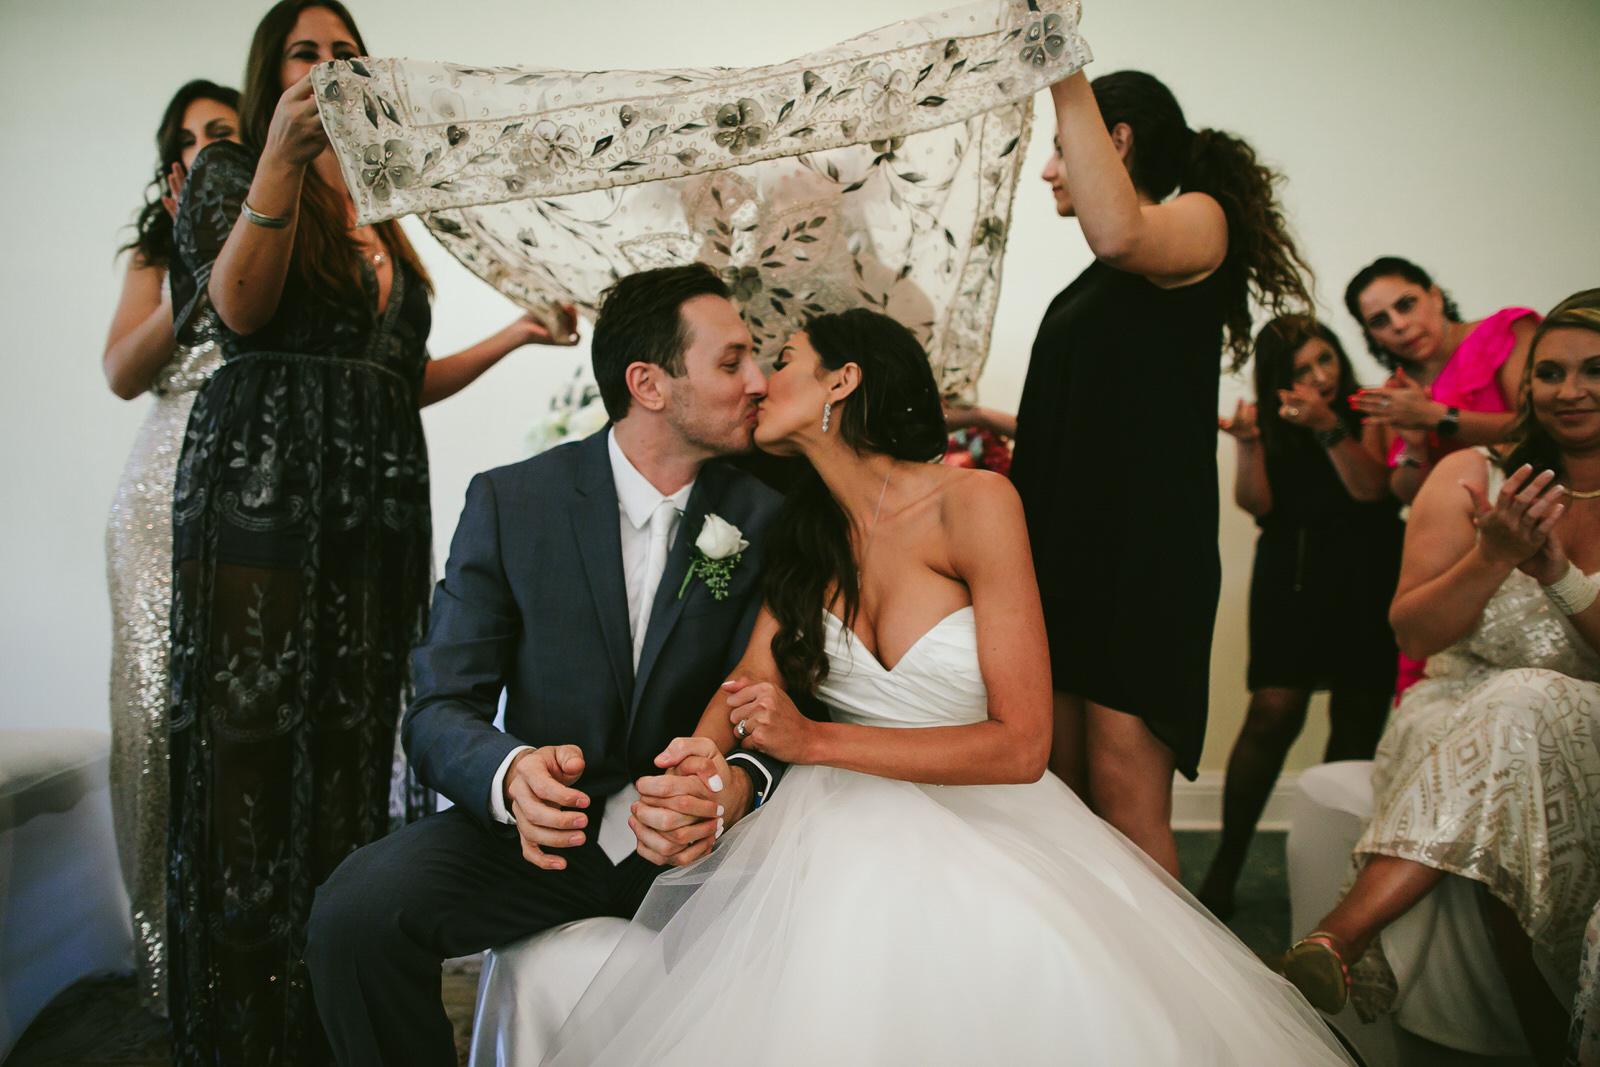 jensen_beach_wedding_persian_ceremony-52.jpg